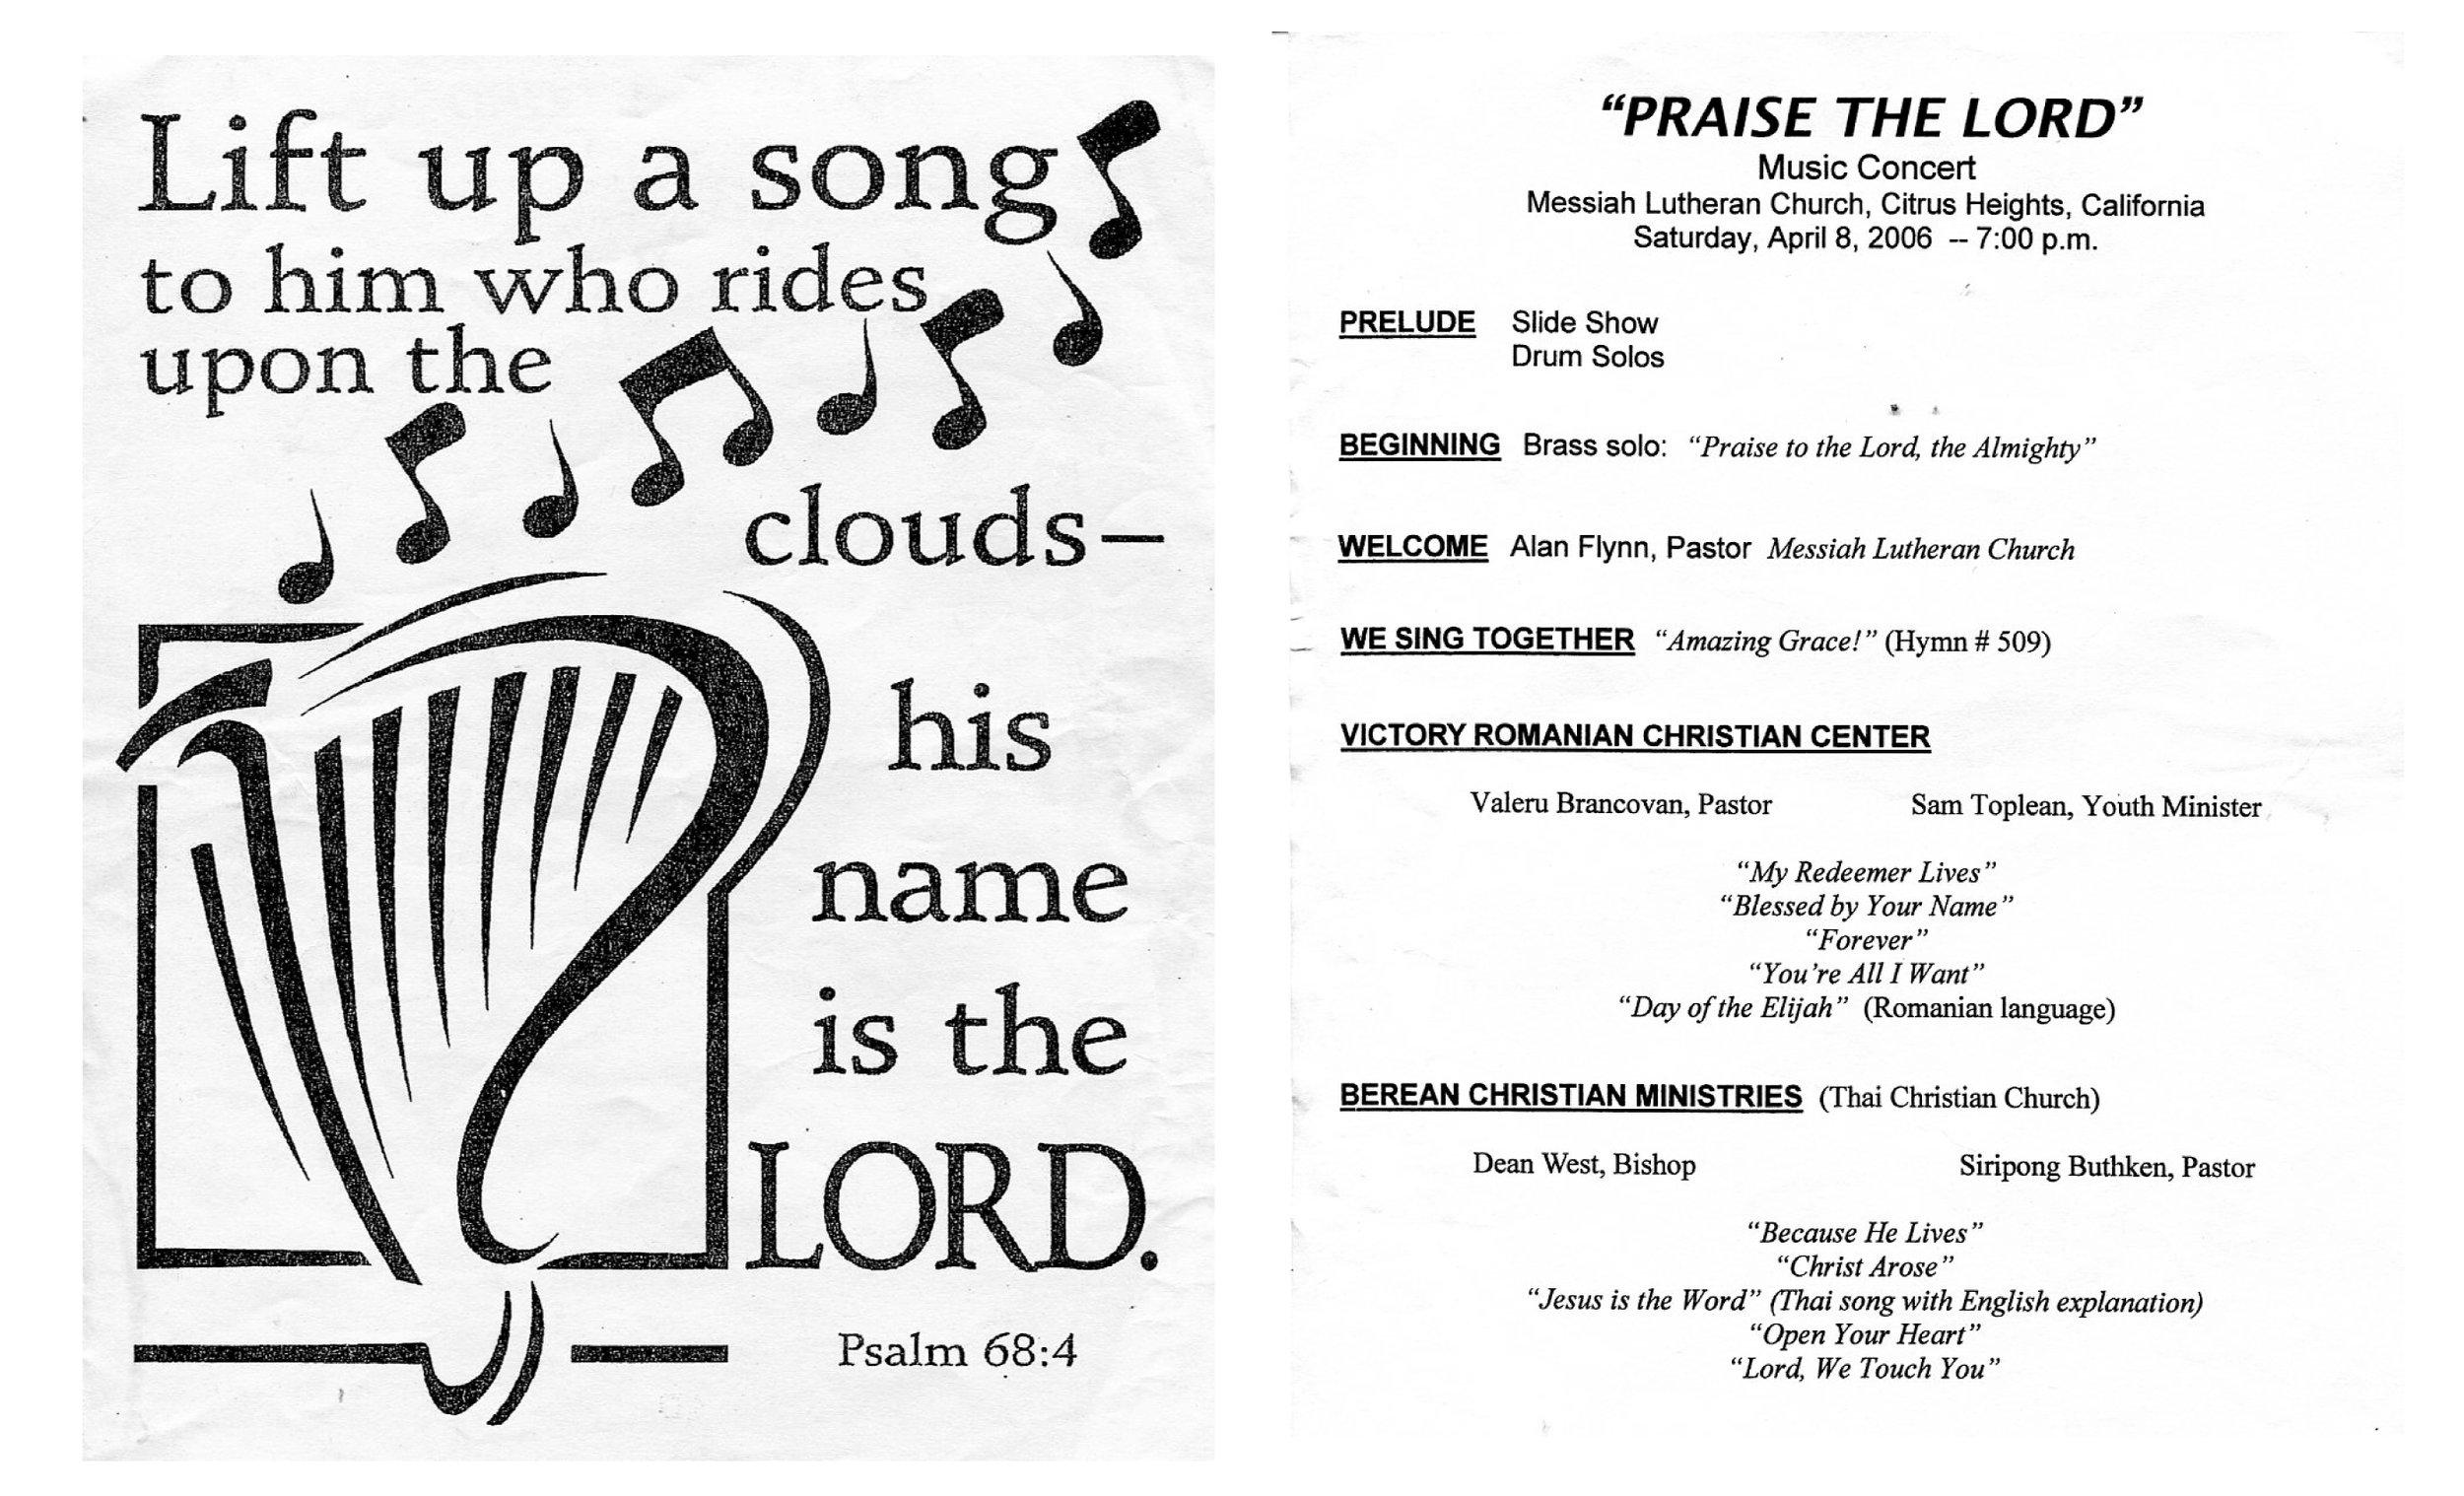 praise1 copy.jpg